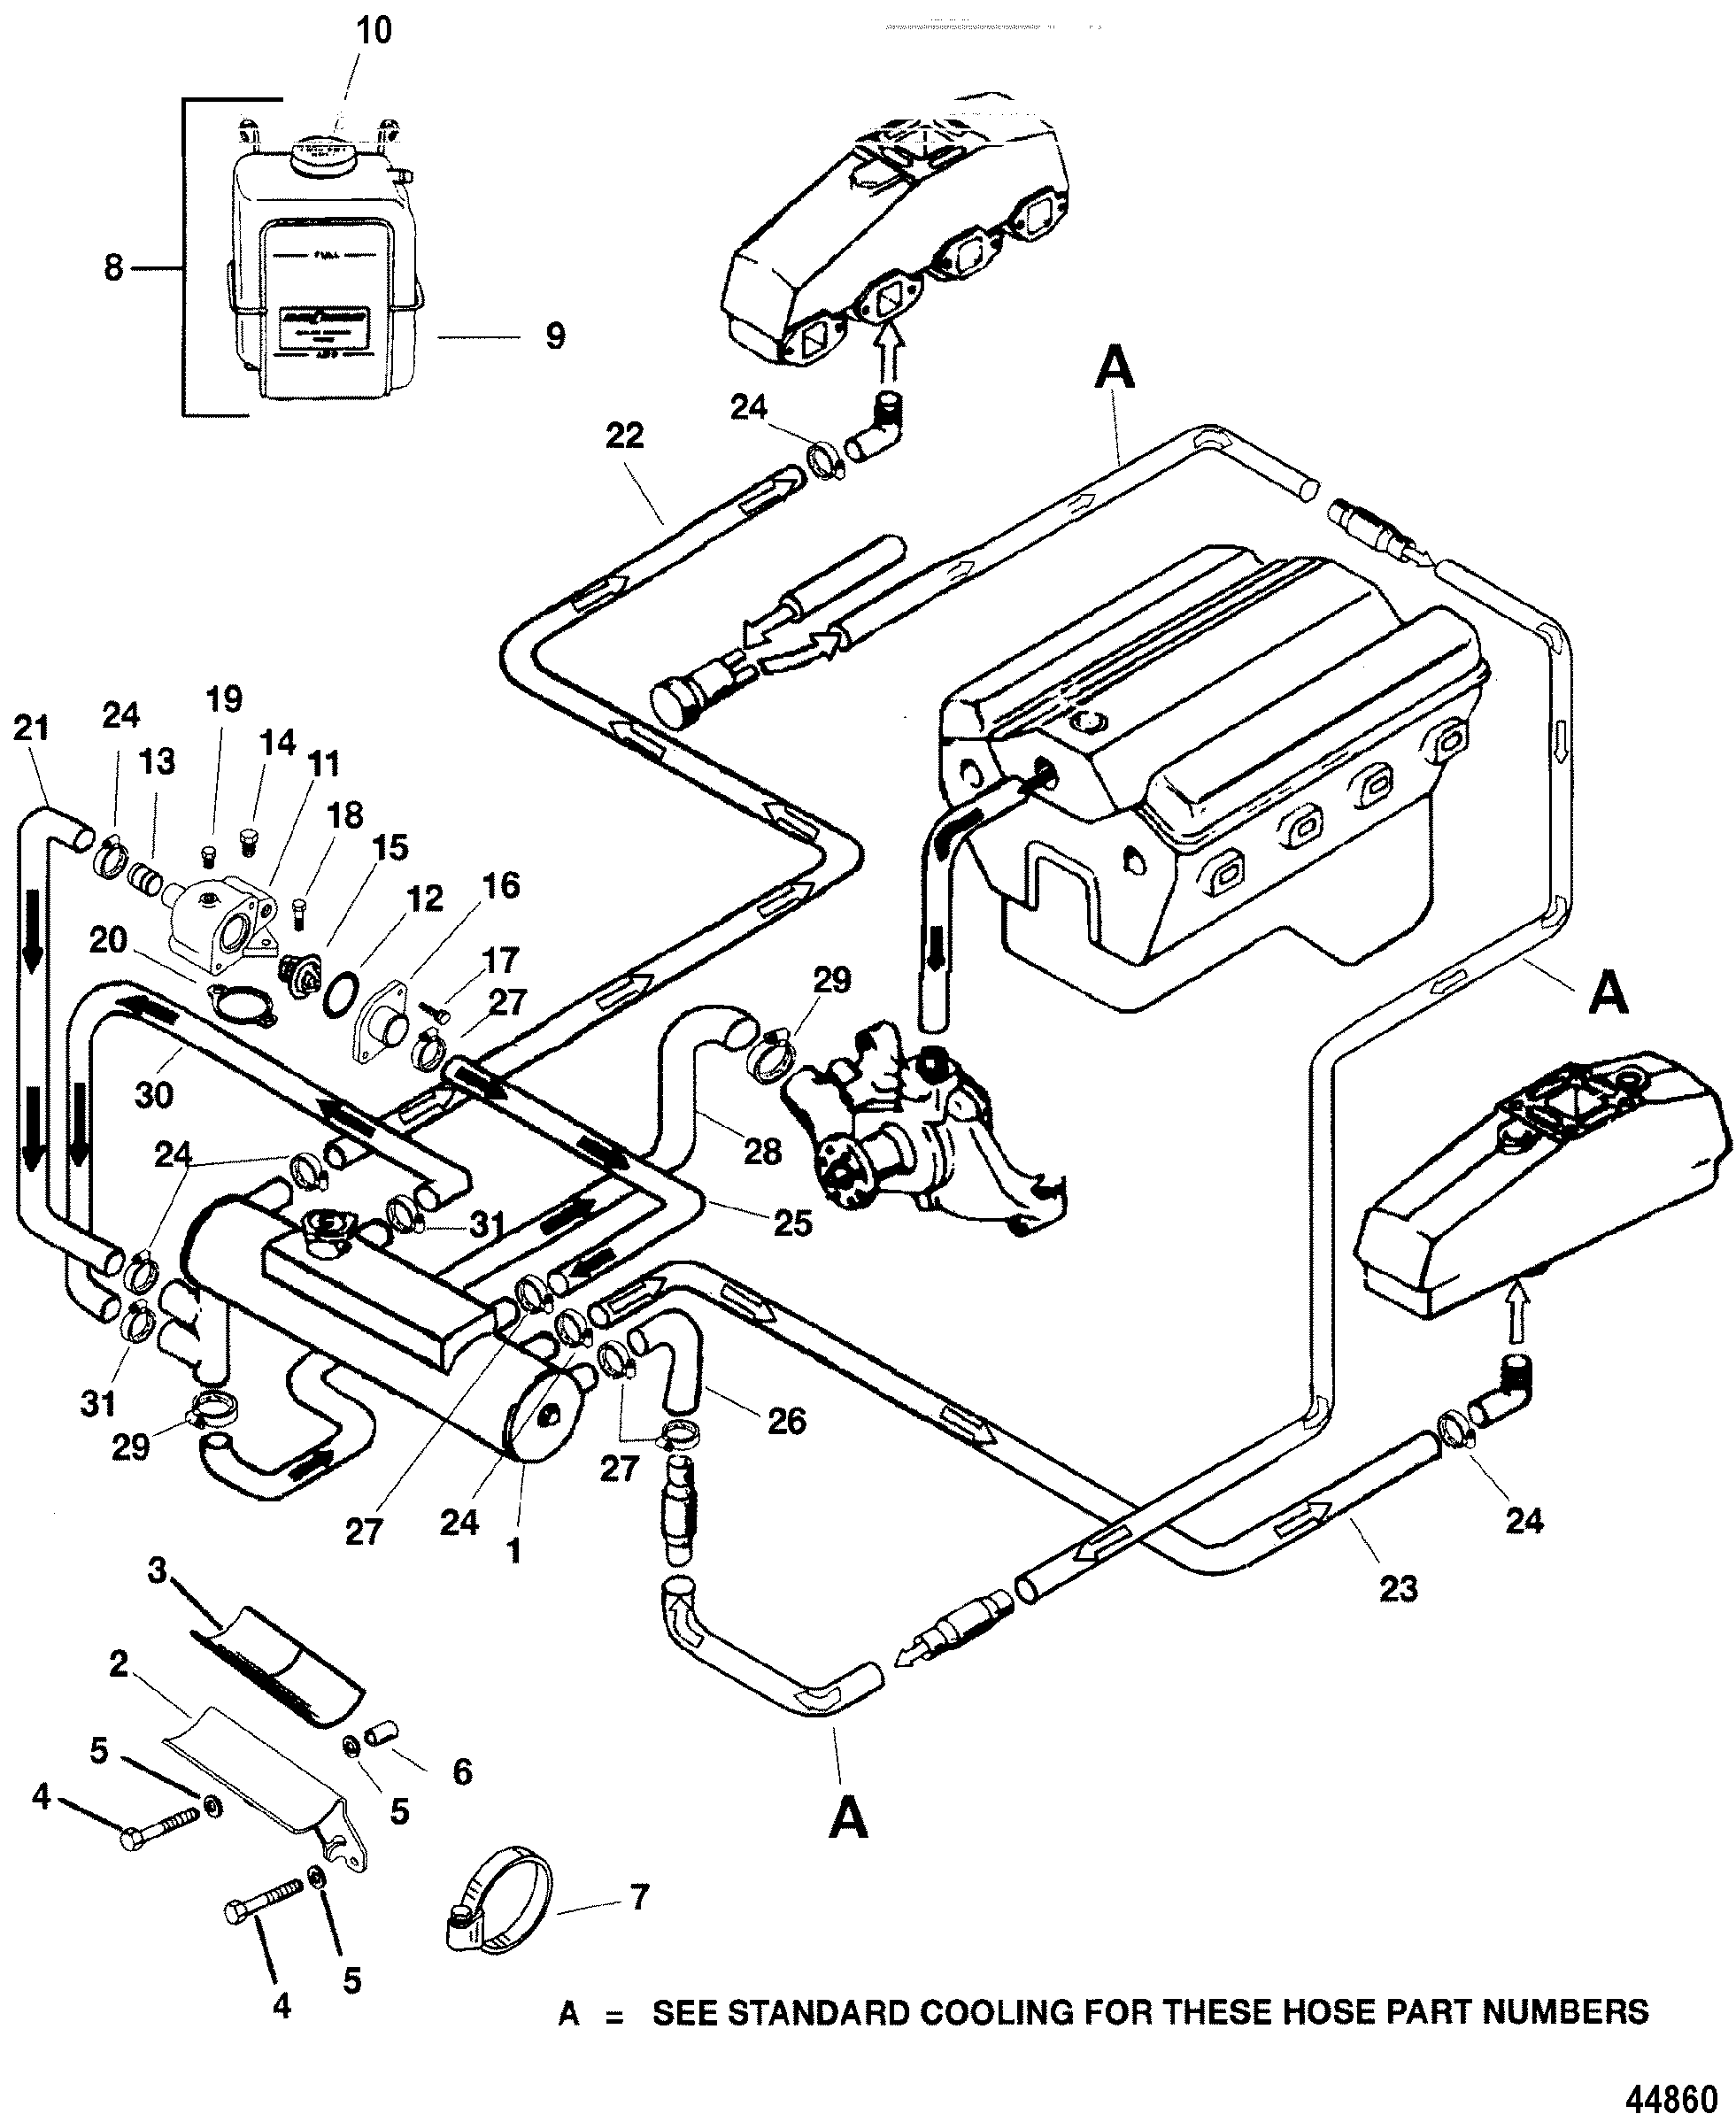 1976 mercruiser 454 cooling system diagram new wiring diagram 2018 mercruiser 7 4l mie mpi lh gen vi boat motor diagrams mercruiser raw water pump hoses 30 mercruiser cooling system diagram on pooptronica